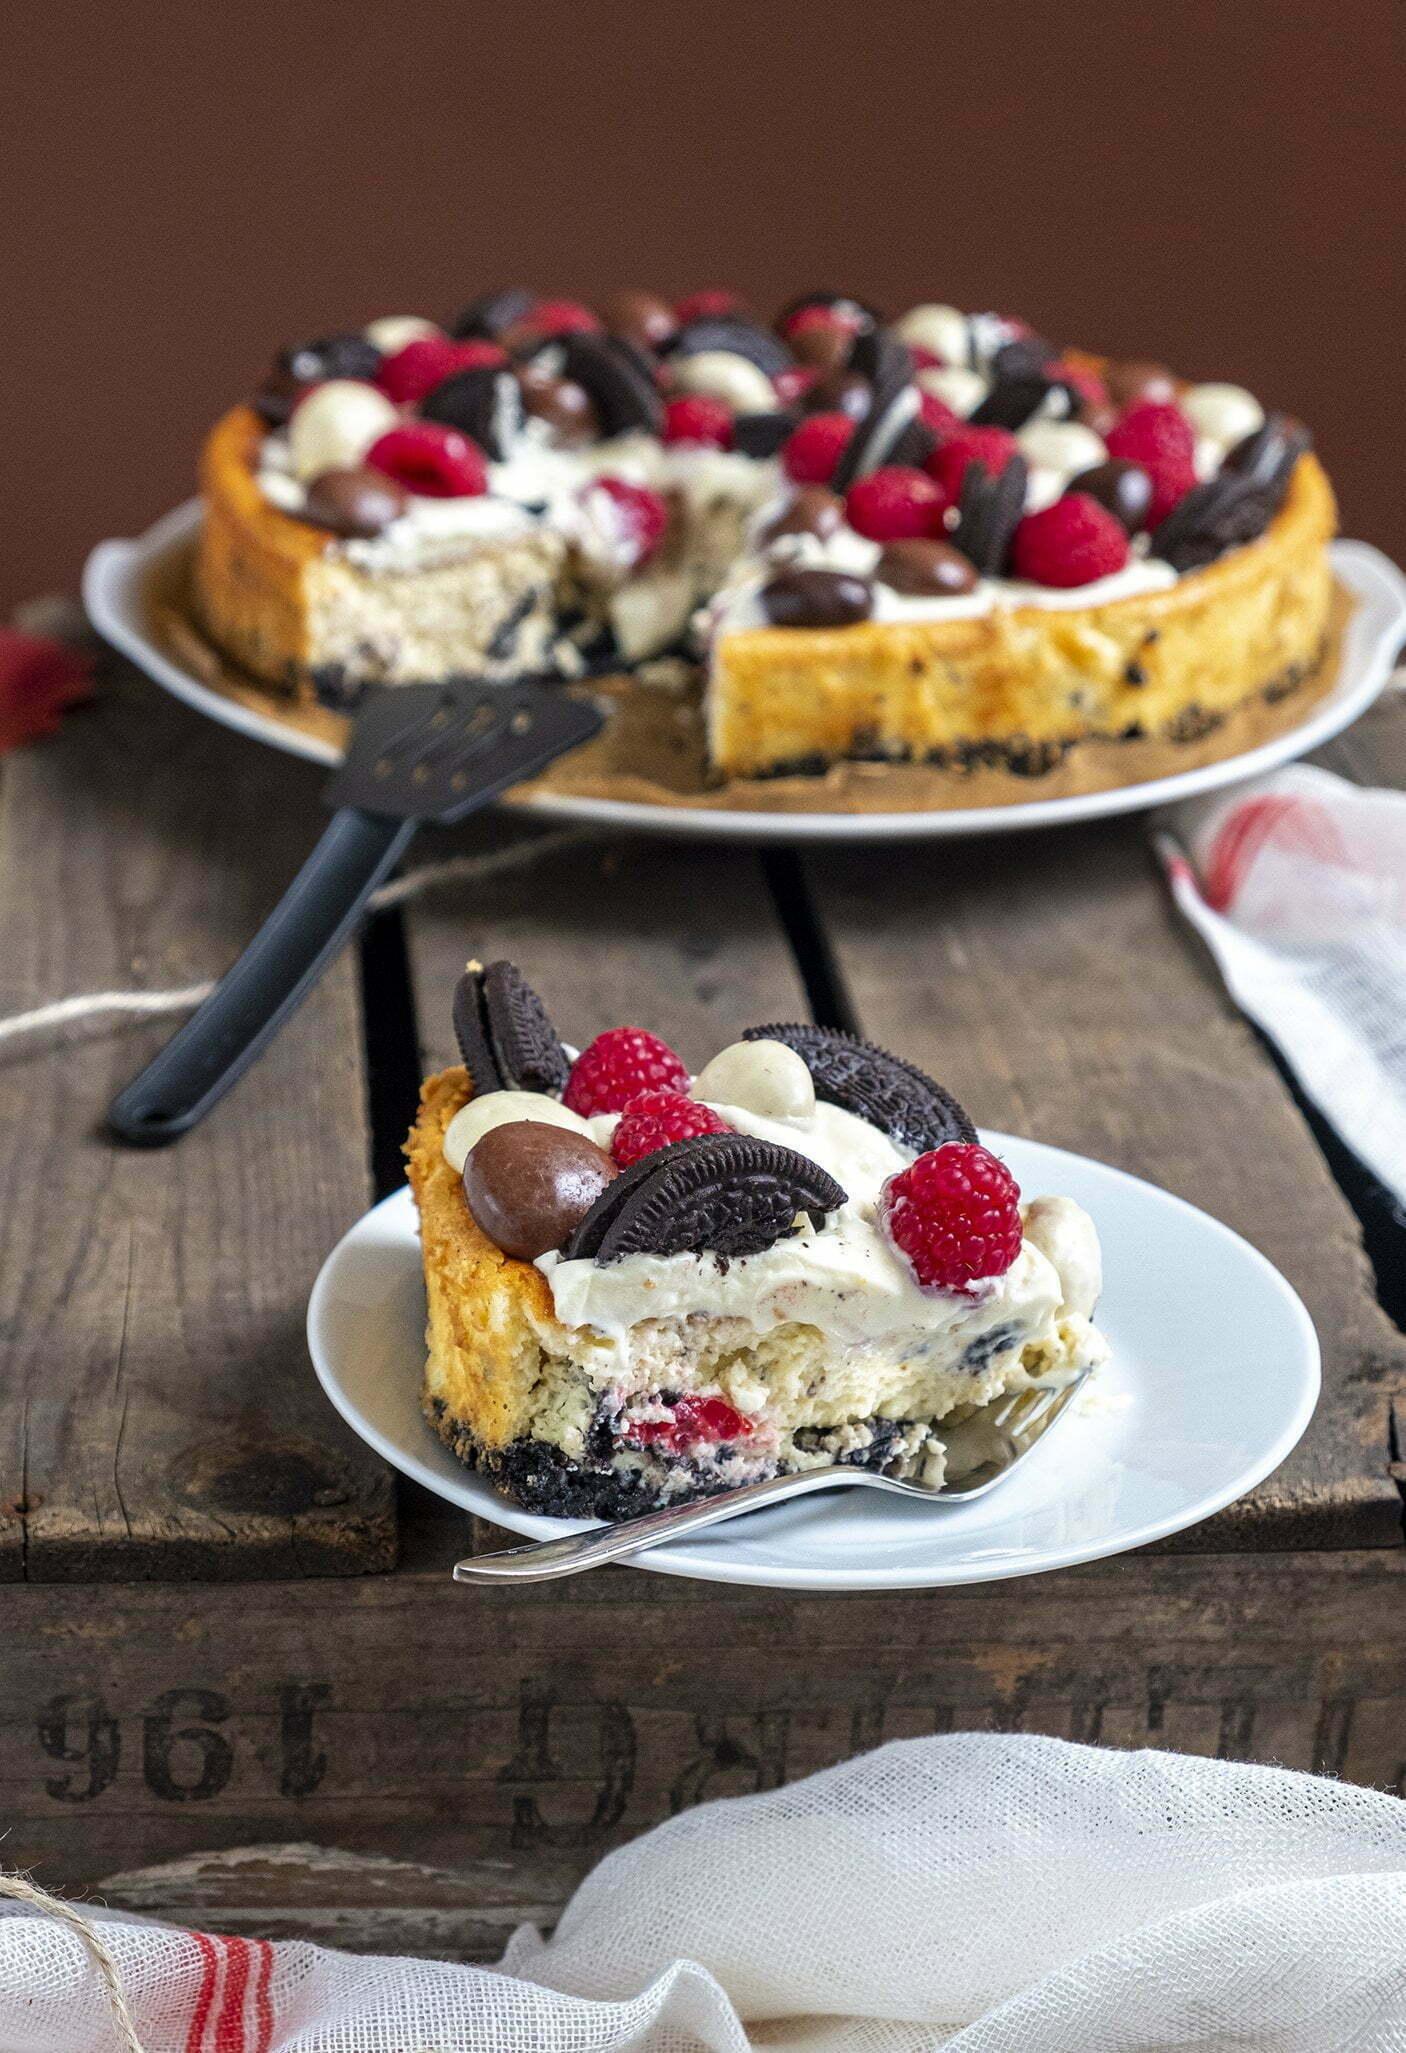 Oreo cheesecake met frambozen en pepernoten